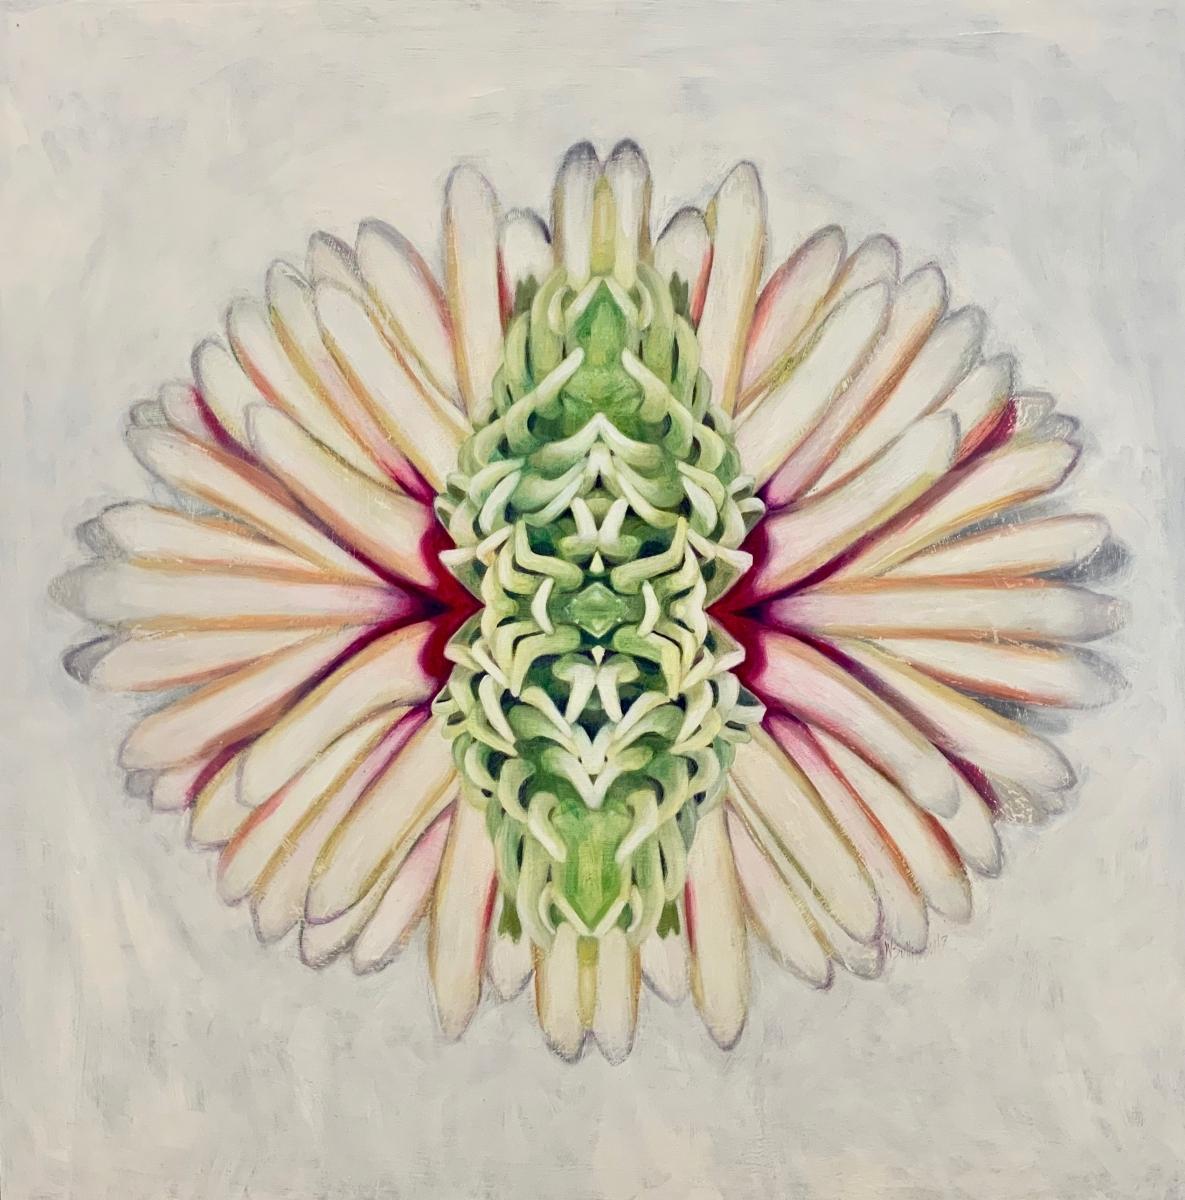 Synthetic Magnolia Interior III (1)